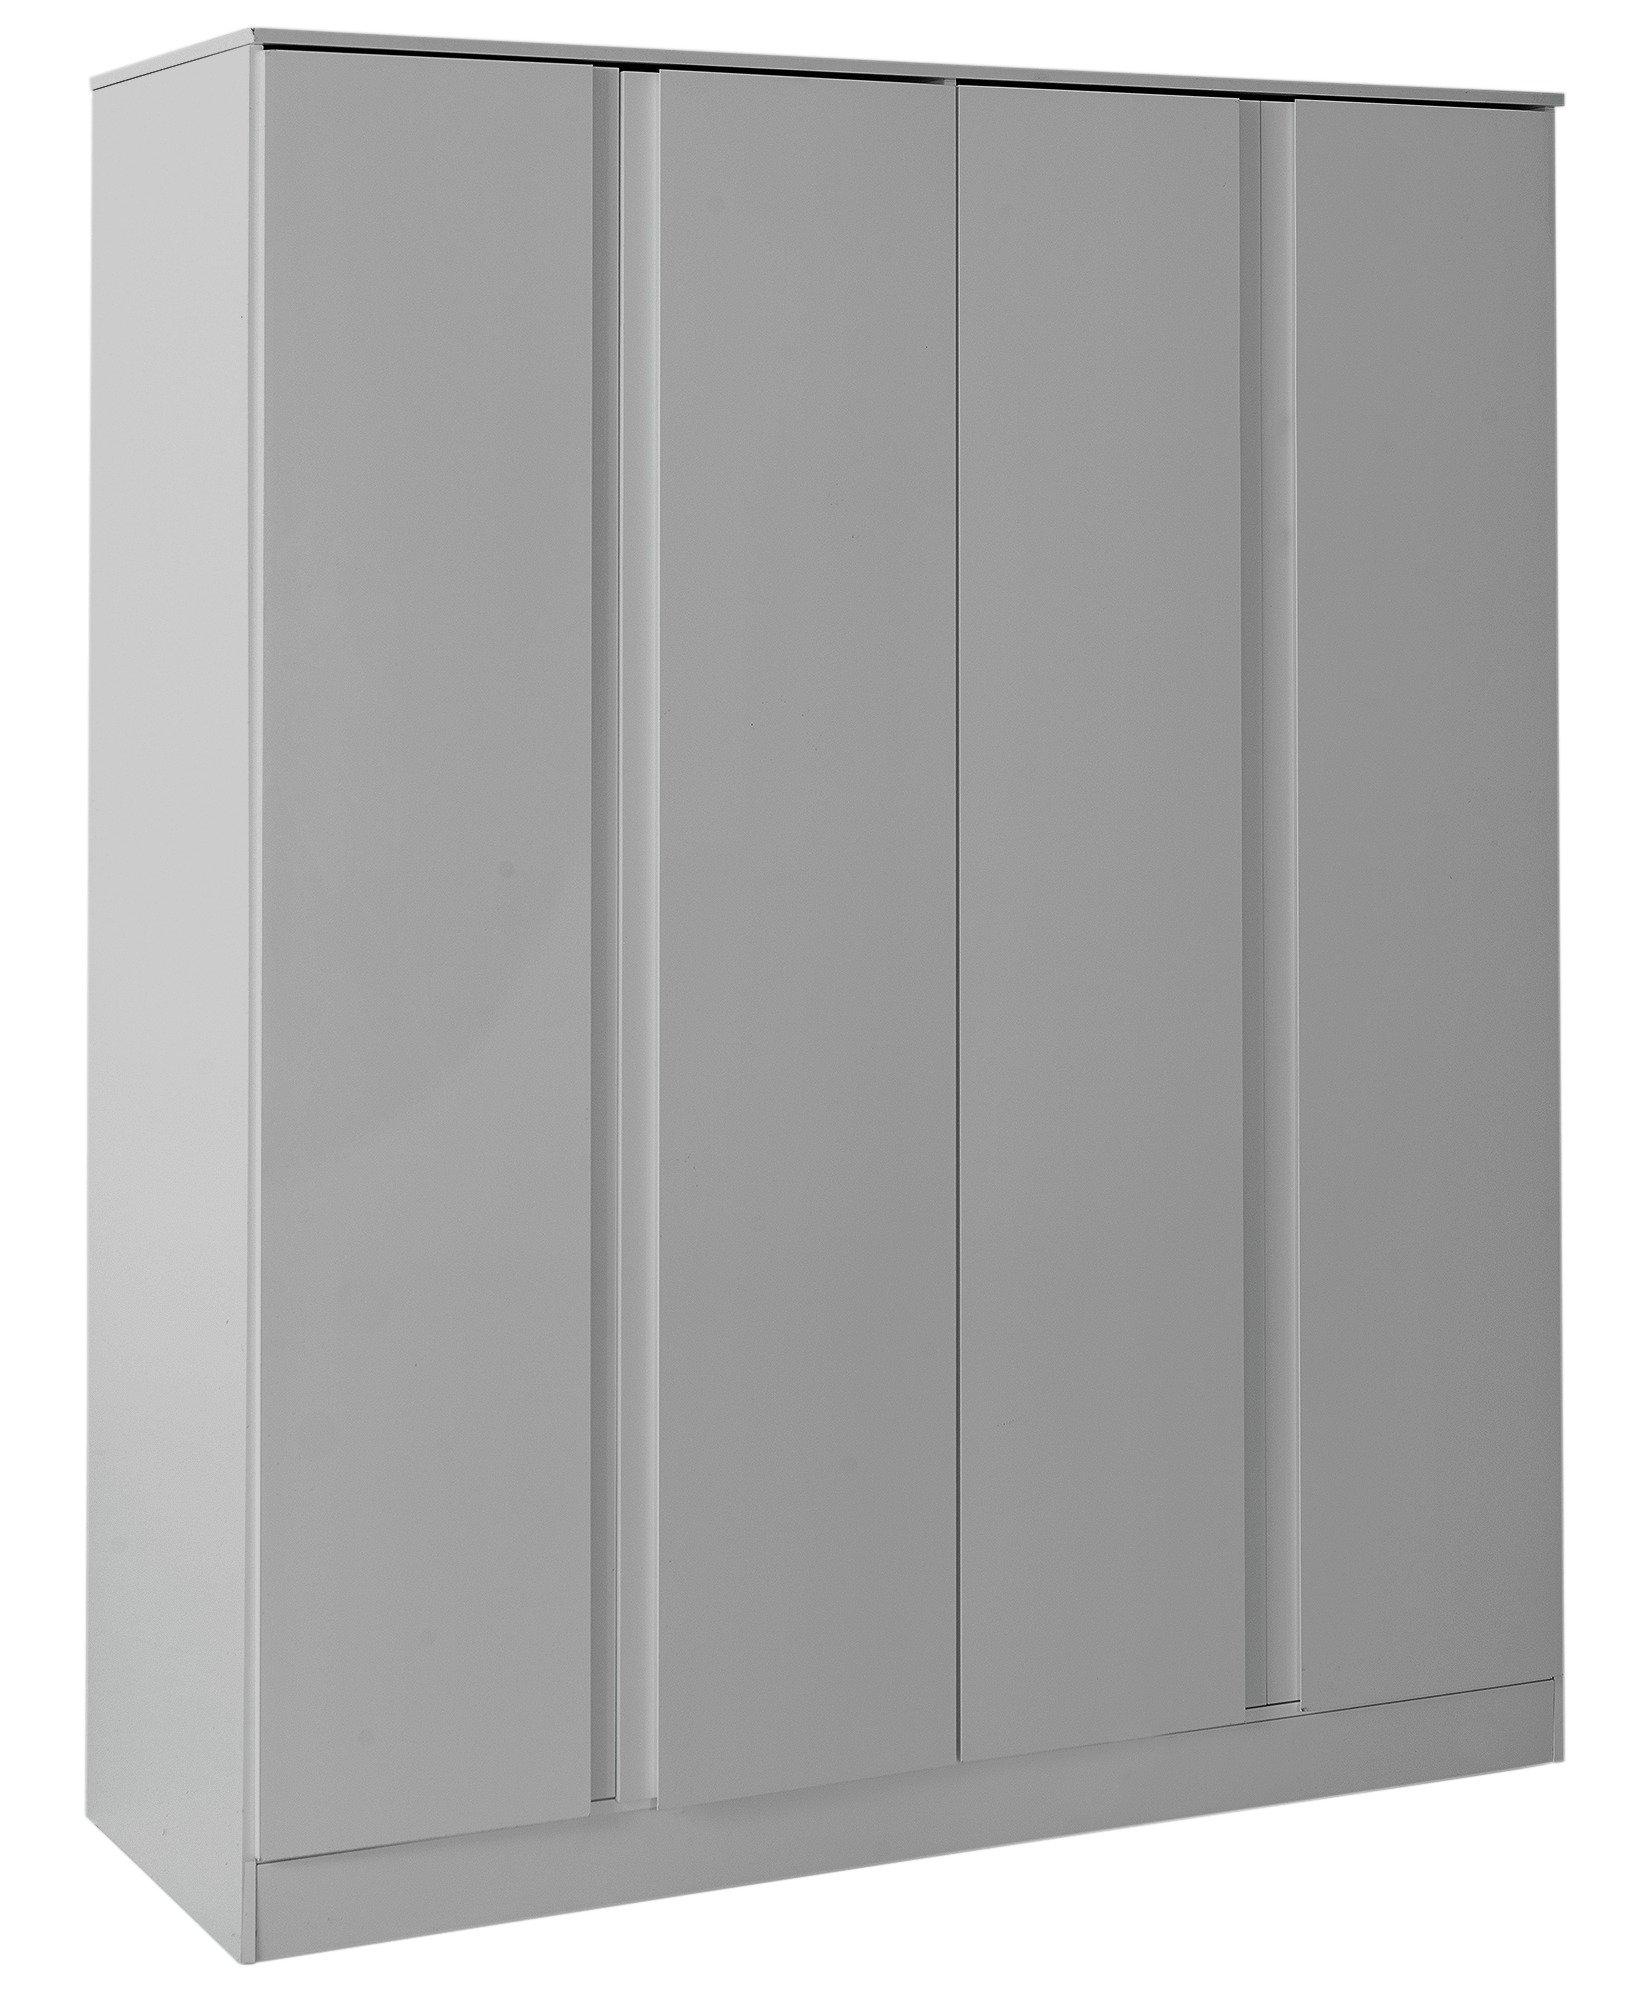 sale on hygena larvik 4 door wardrobe grey gloss. Black Bedroom Furniture Sets. Home Design Ideas